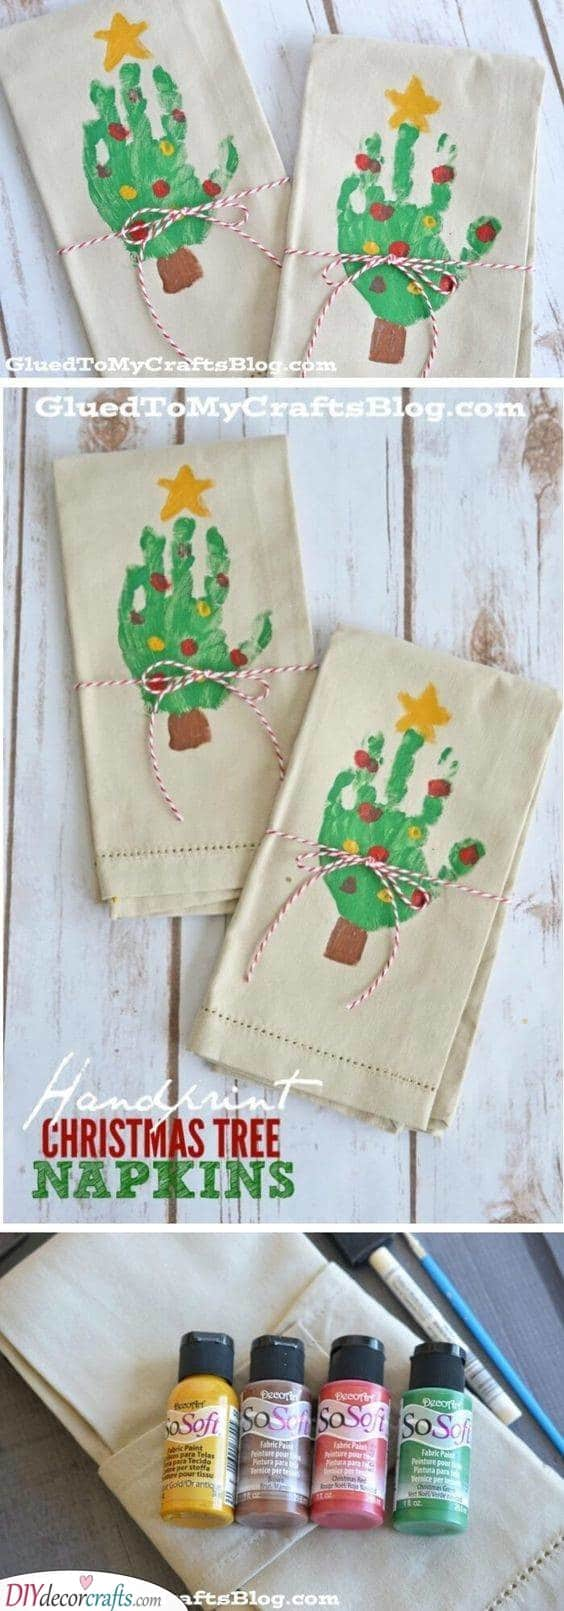 Napkins - Handmade Christmas Gift Ideas for Grandparents